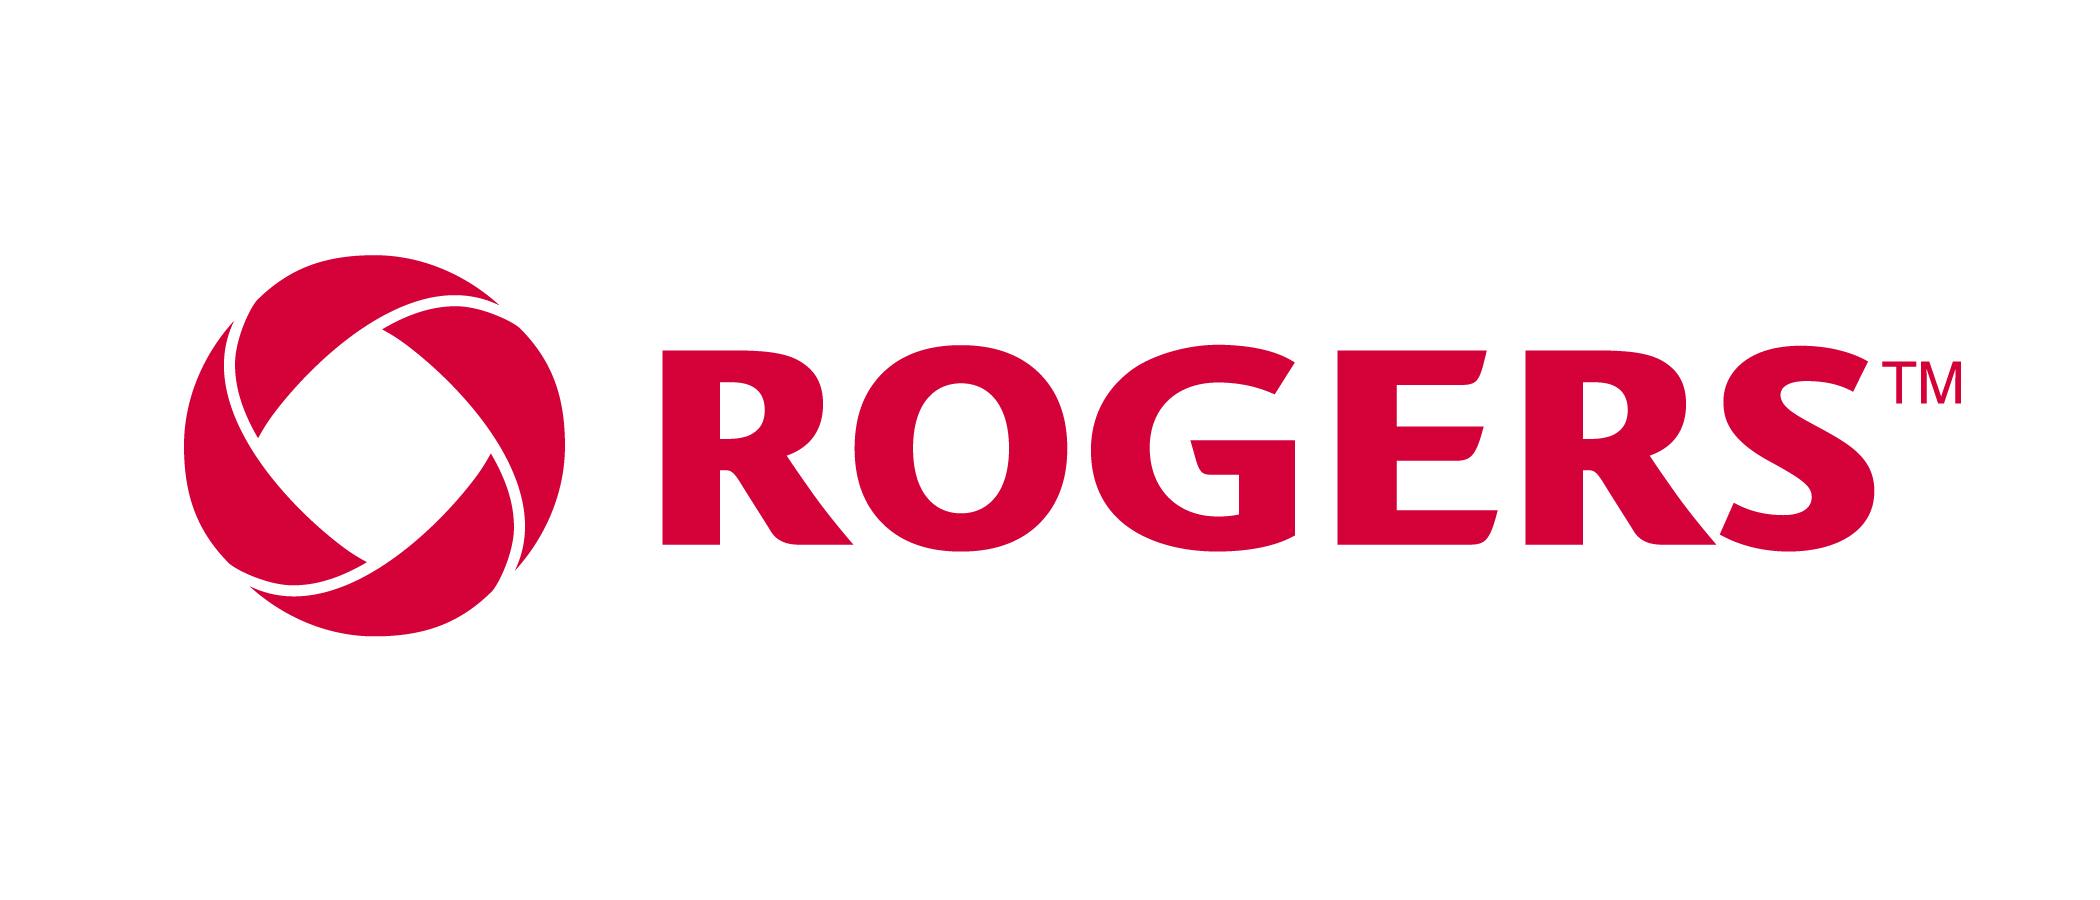 Rogers exclusive X Phone